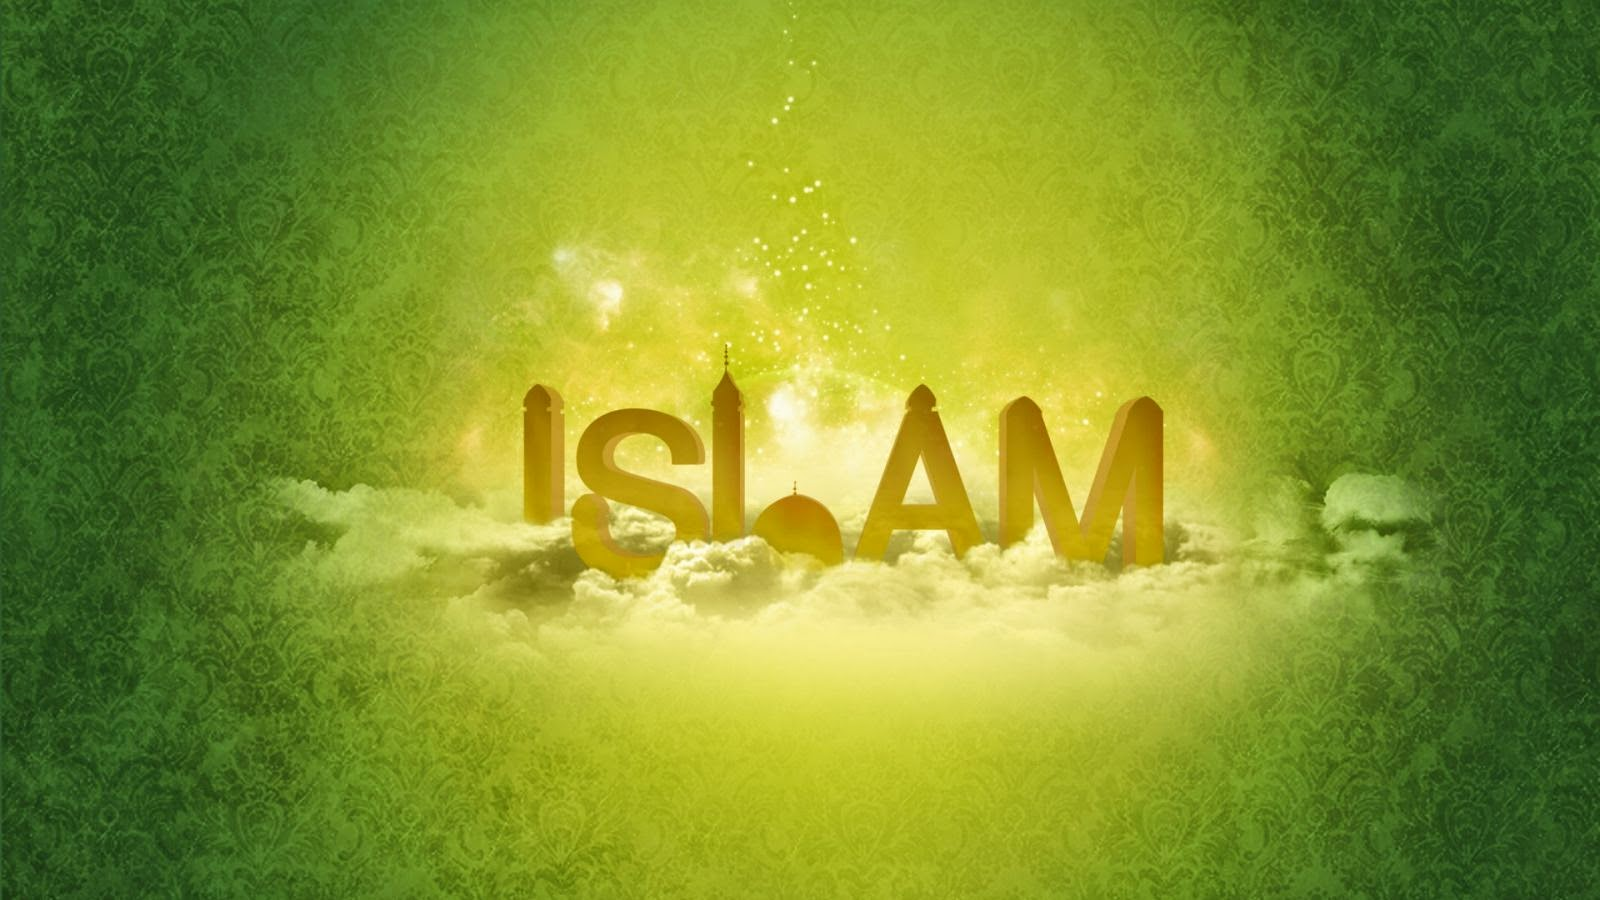 Mempertanyakan Islam sebagai Agama yang Benar